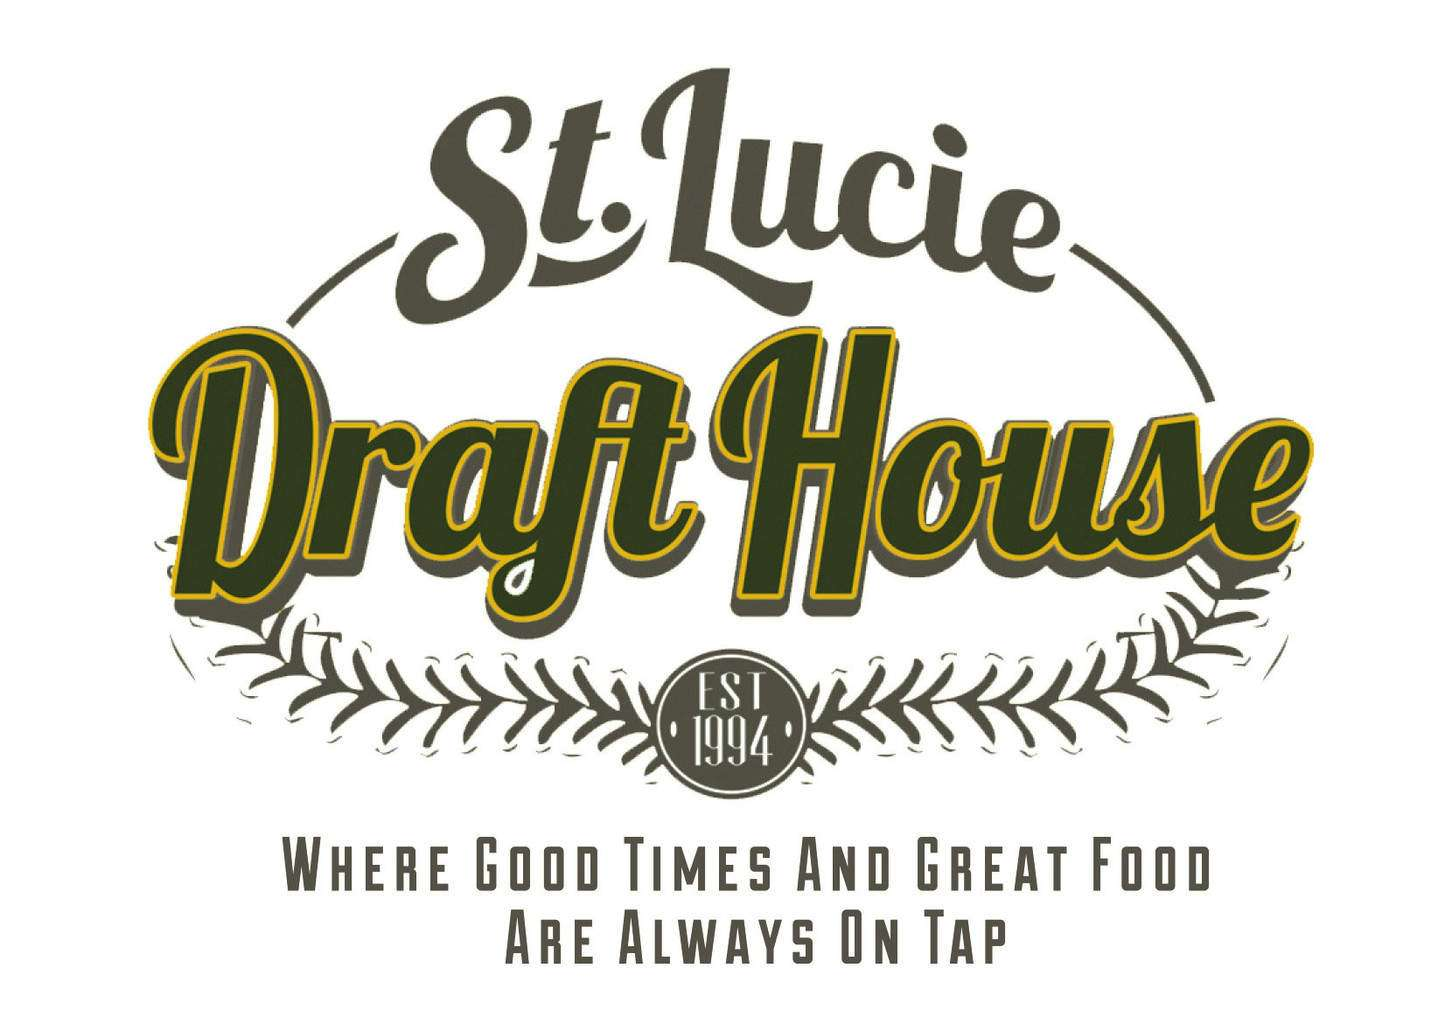 St. Lucie Draft House